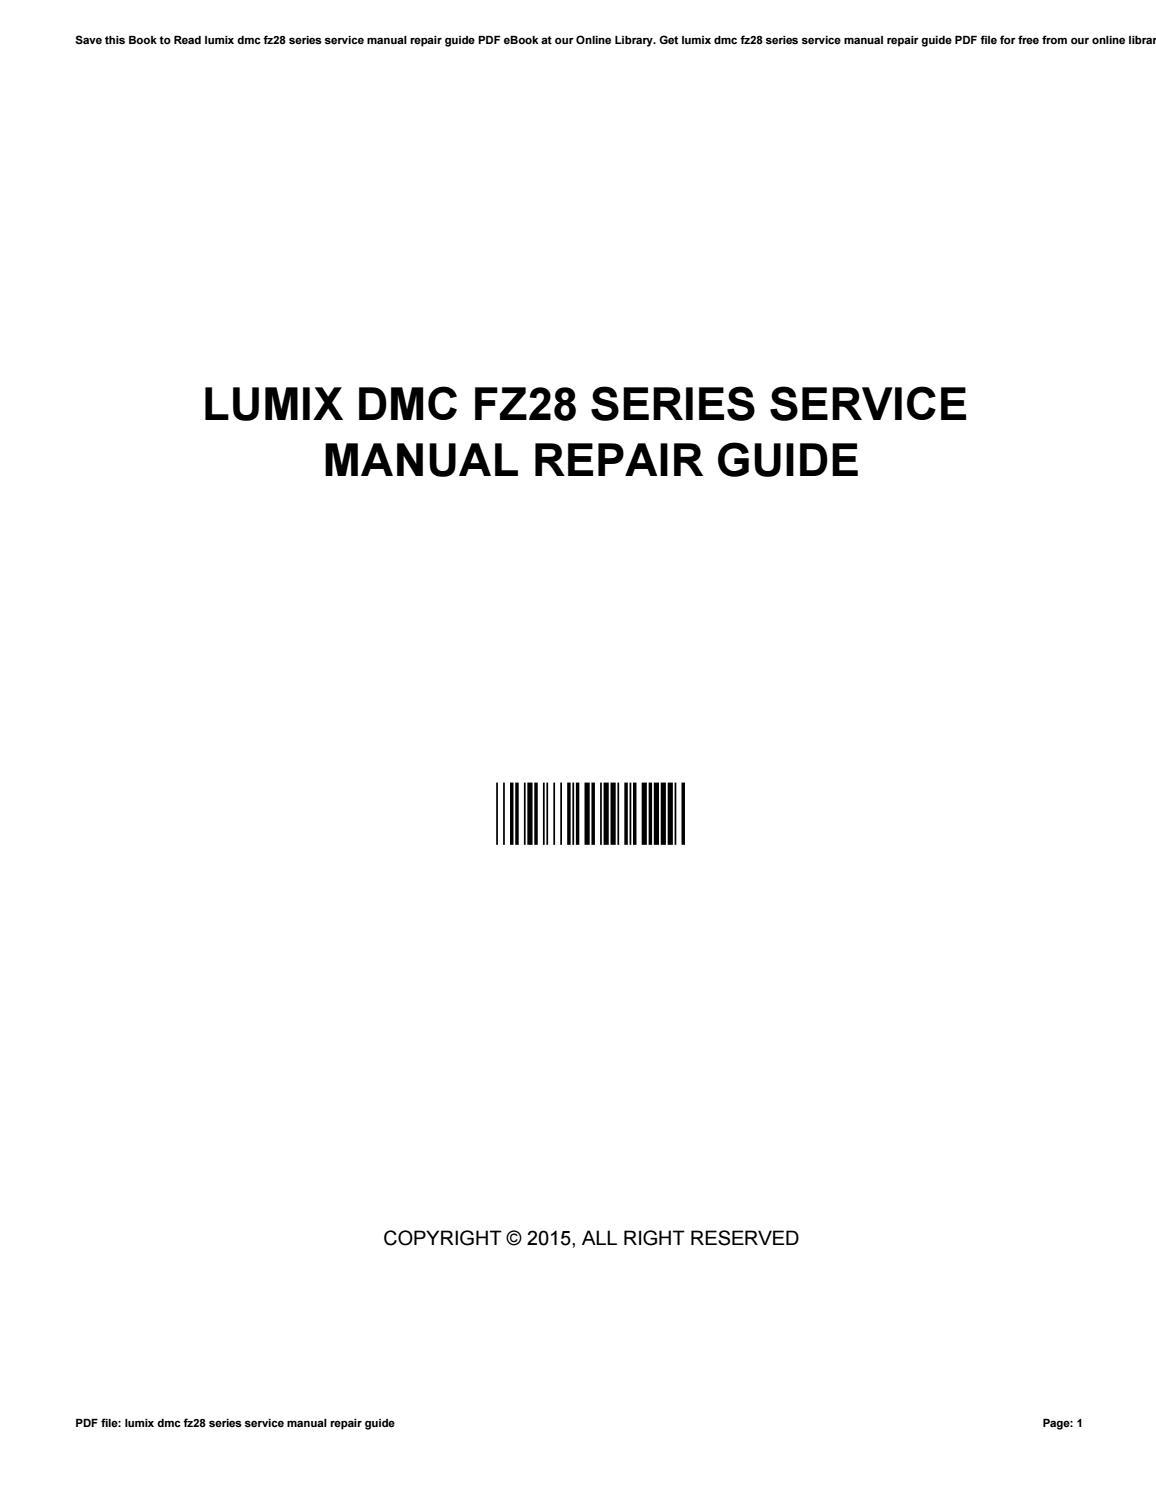 Lumix dmc fz28 series service manual repair guide by JonathanRosen2320 -  issuu